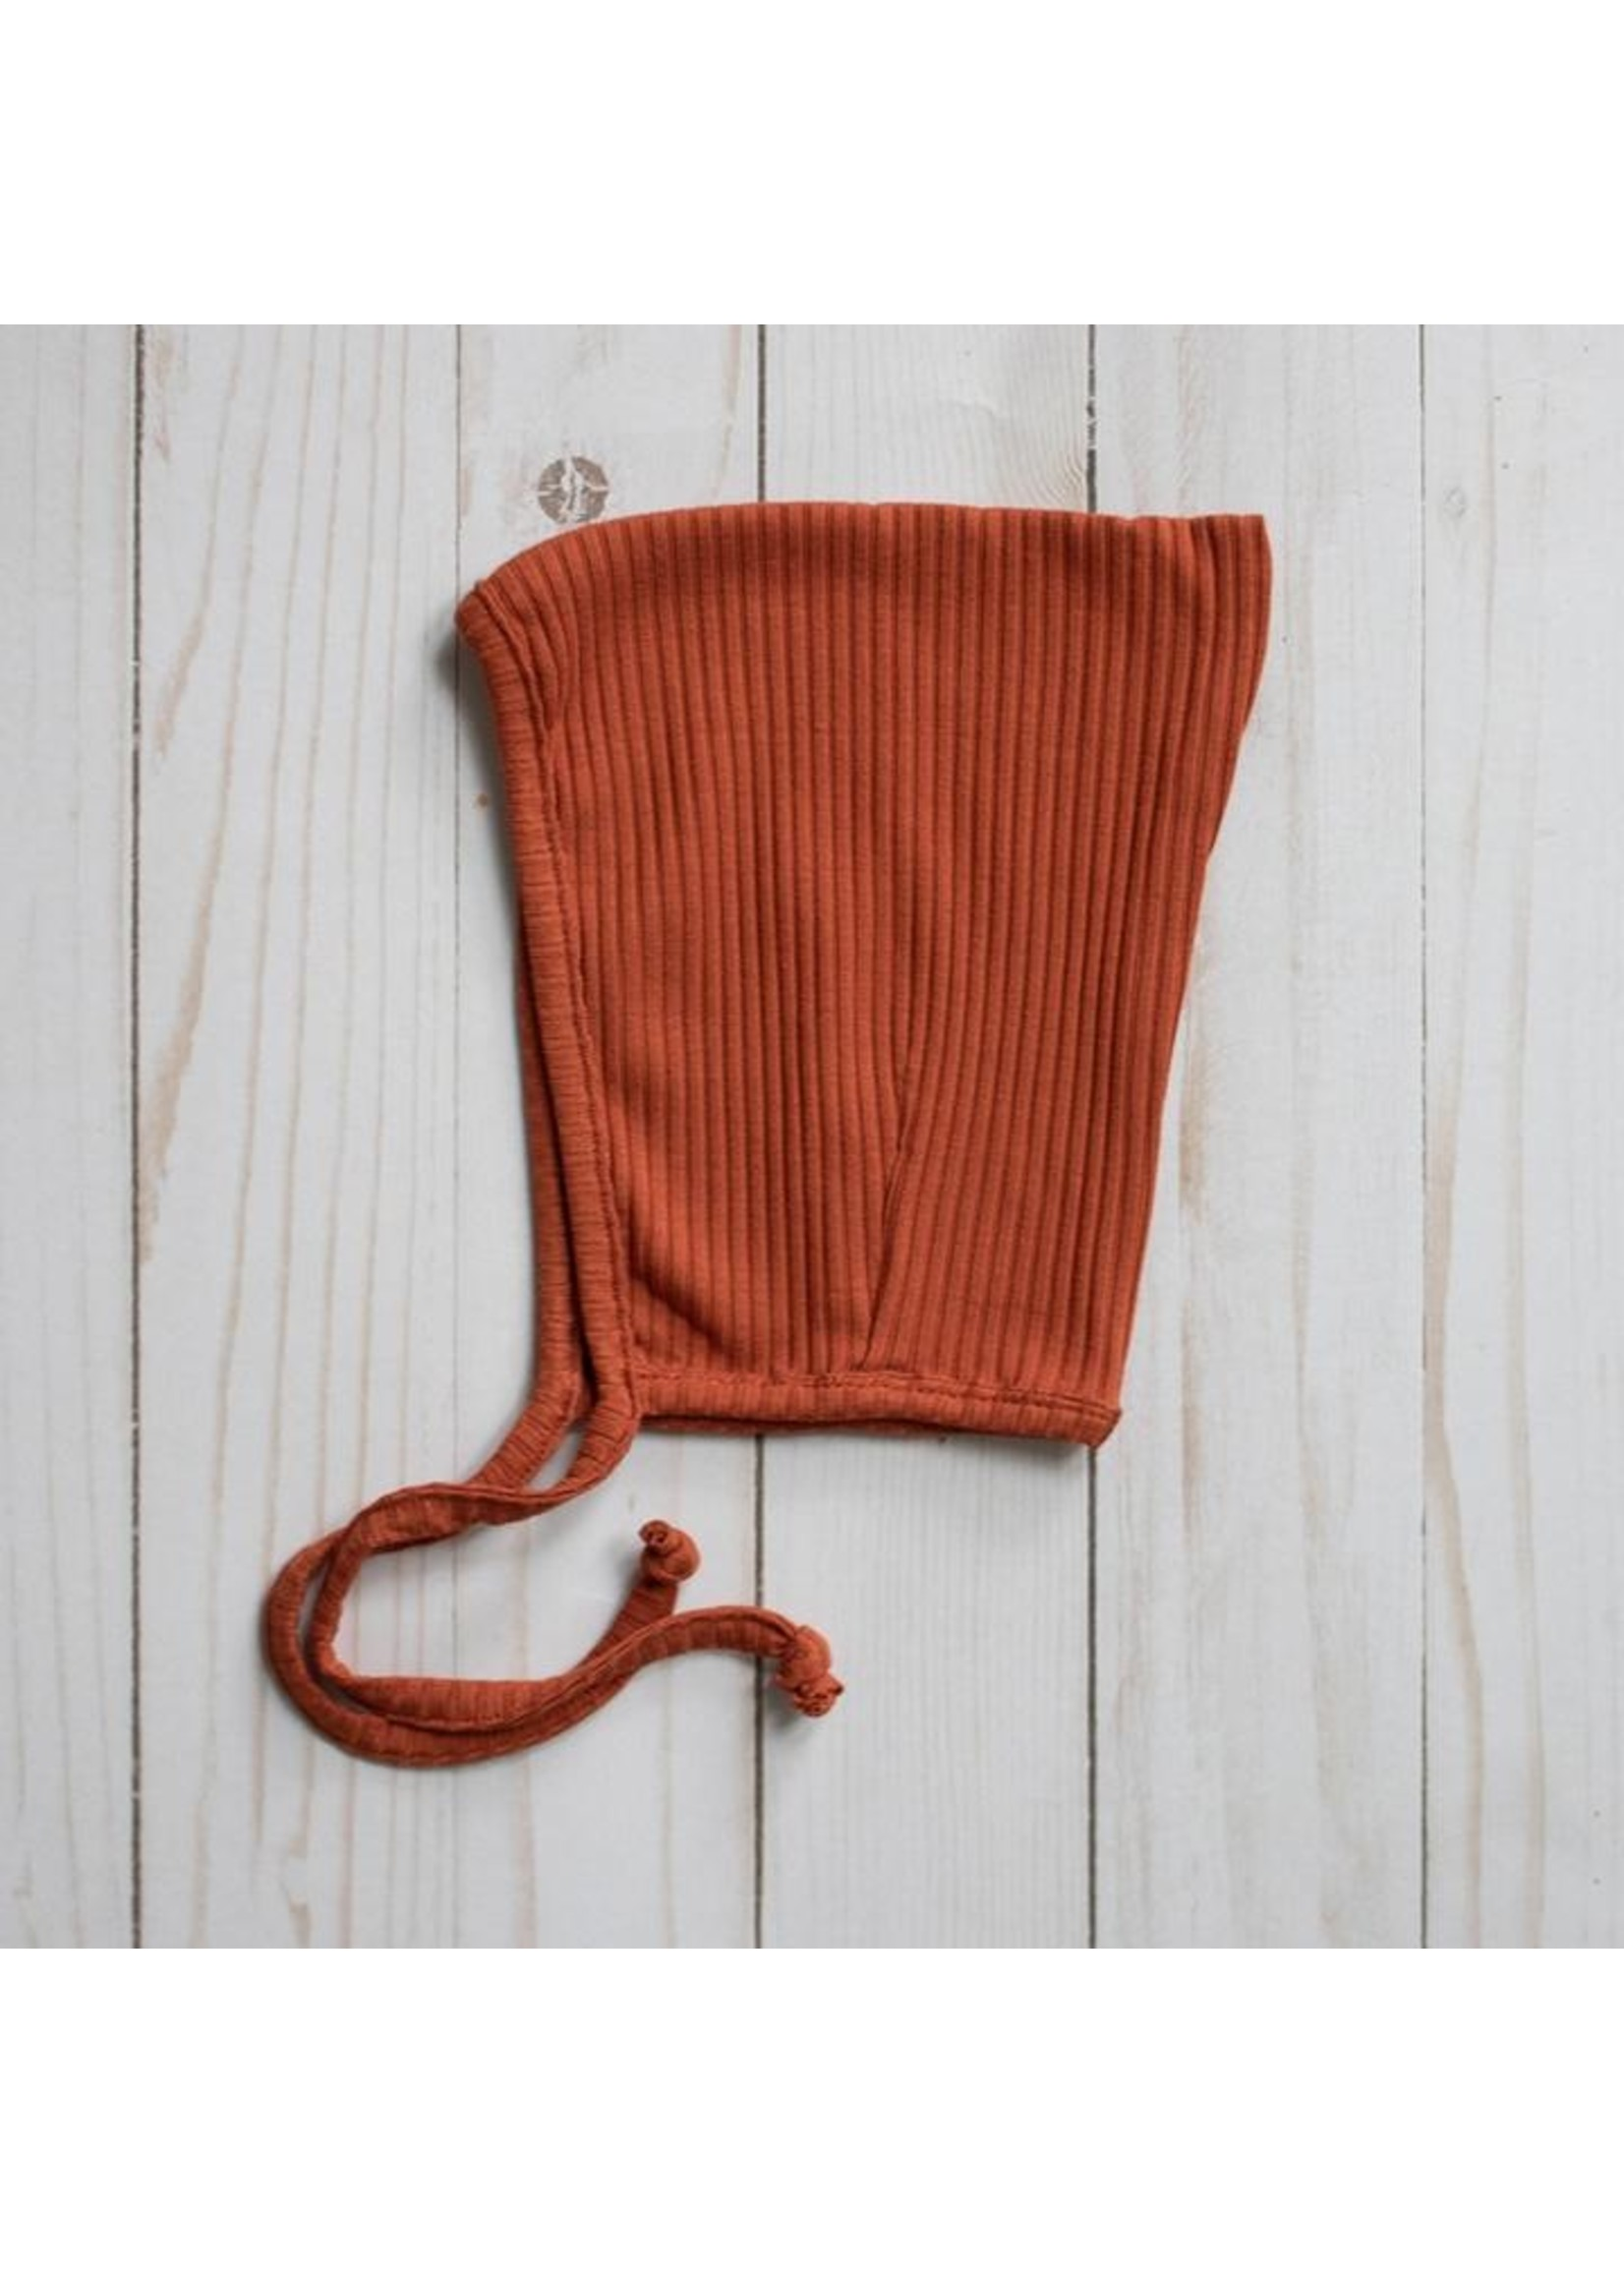 MASE & HATS Bonnet Pixie en Bamboo Rust